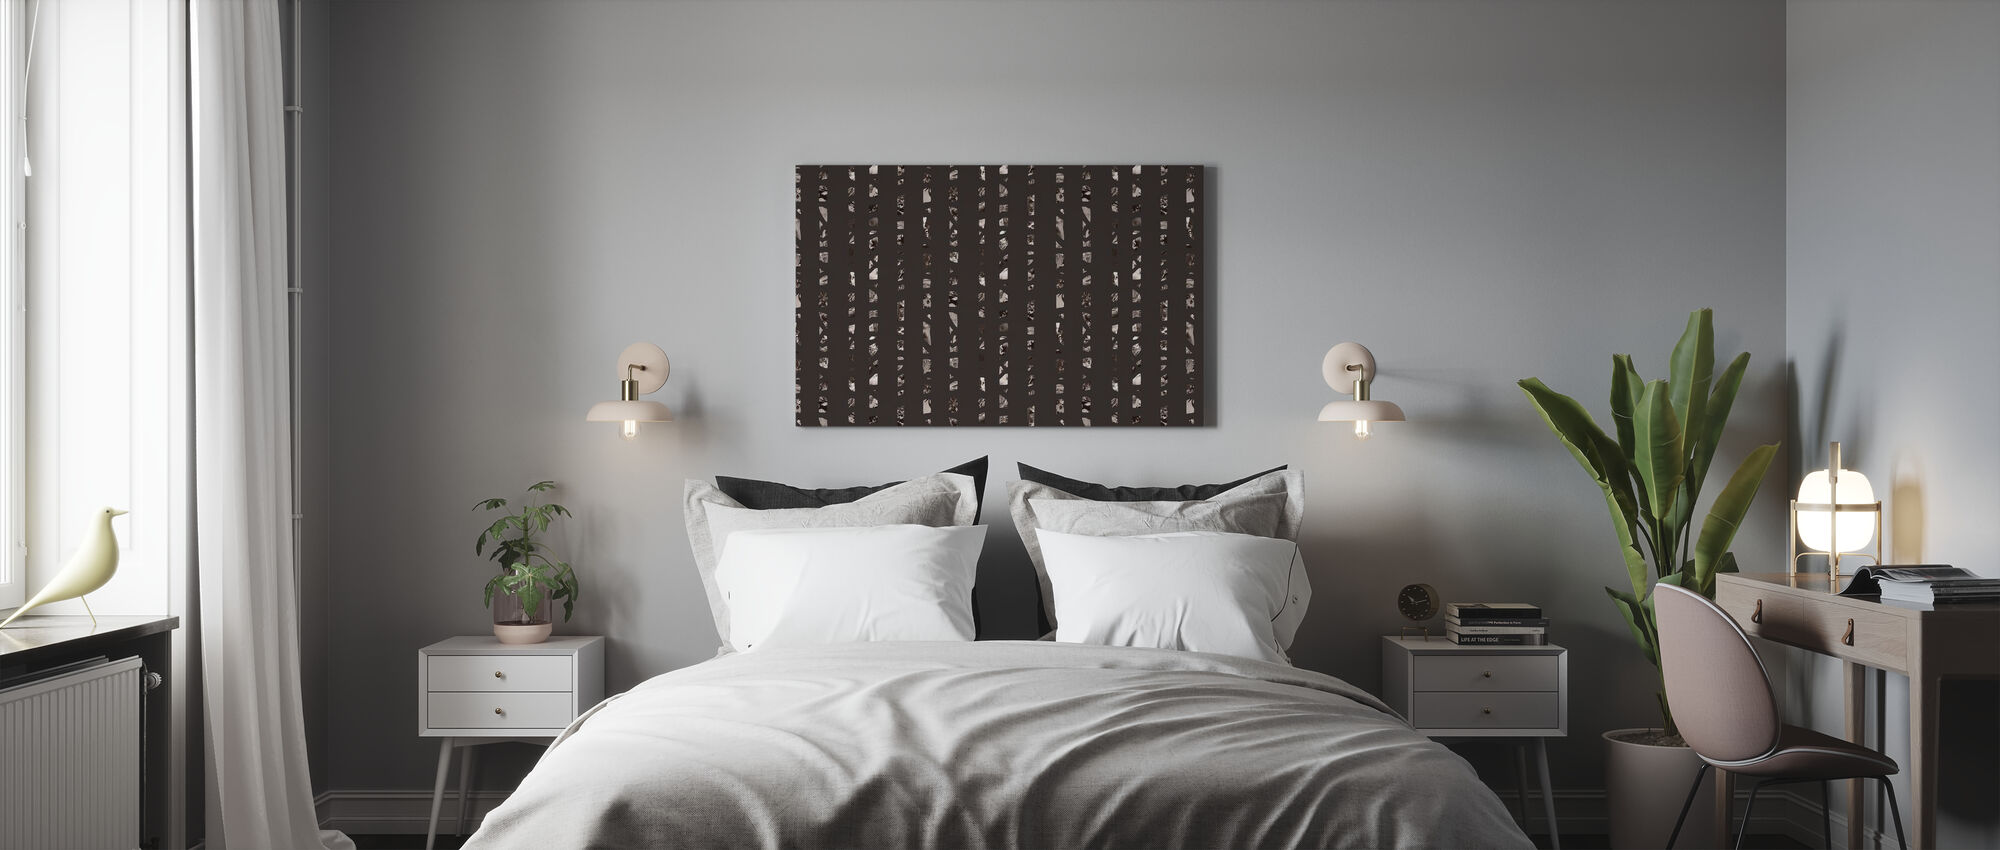 Studio Rita | Julia Heurling - Achter bomen - Donker - Canvas print - Slaapkamer